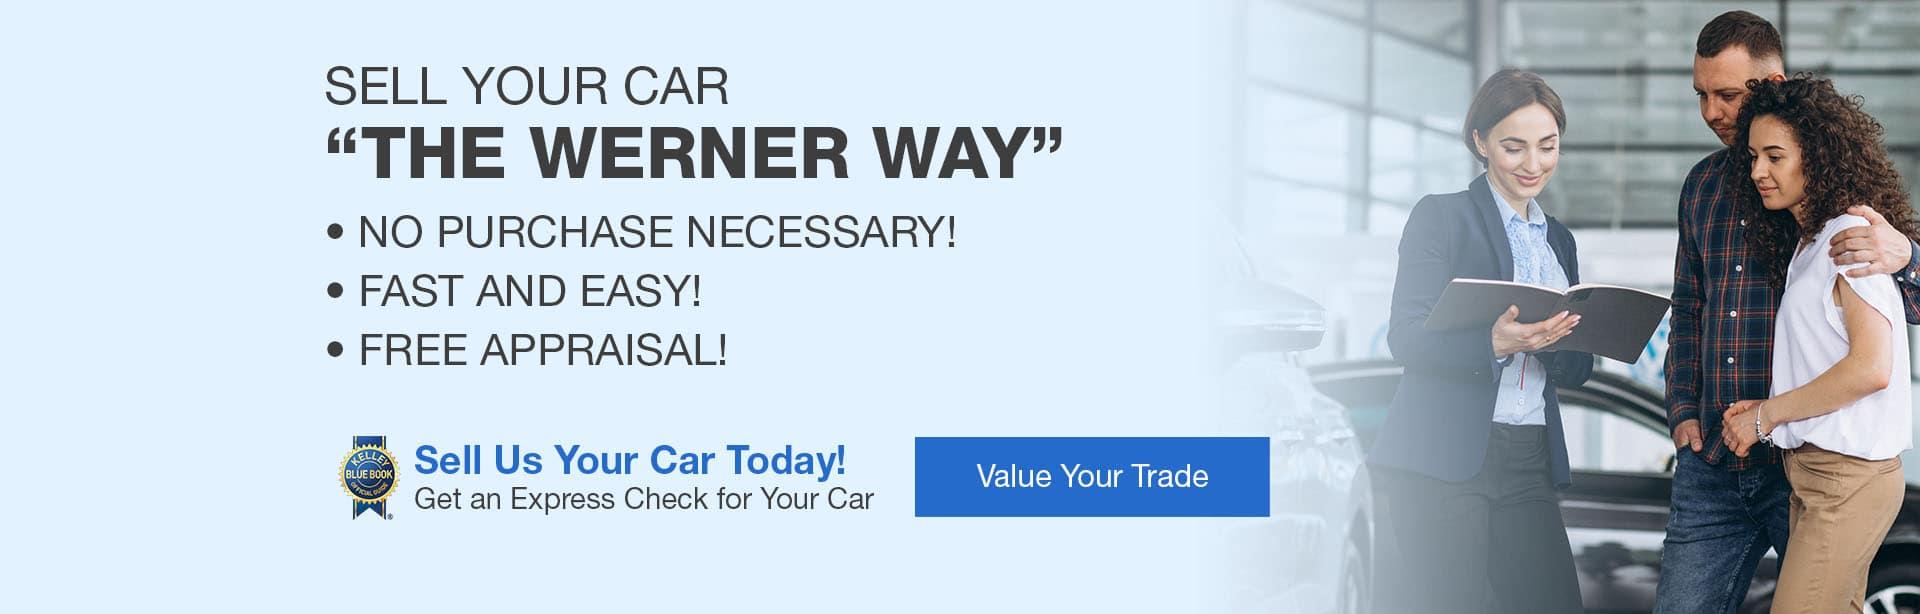 2021-08-002_Werner Hyundai-Sell your Car_Slider 1920x614_main-Sell your car